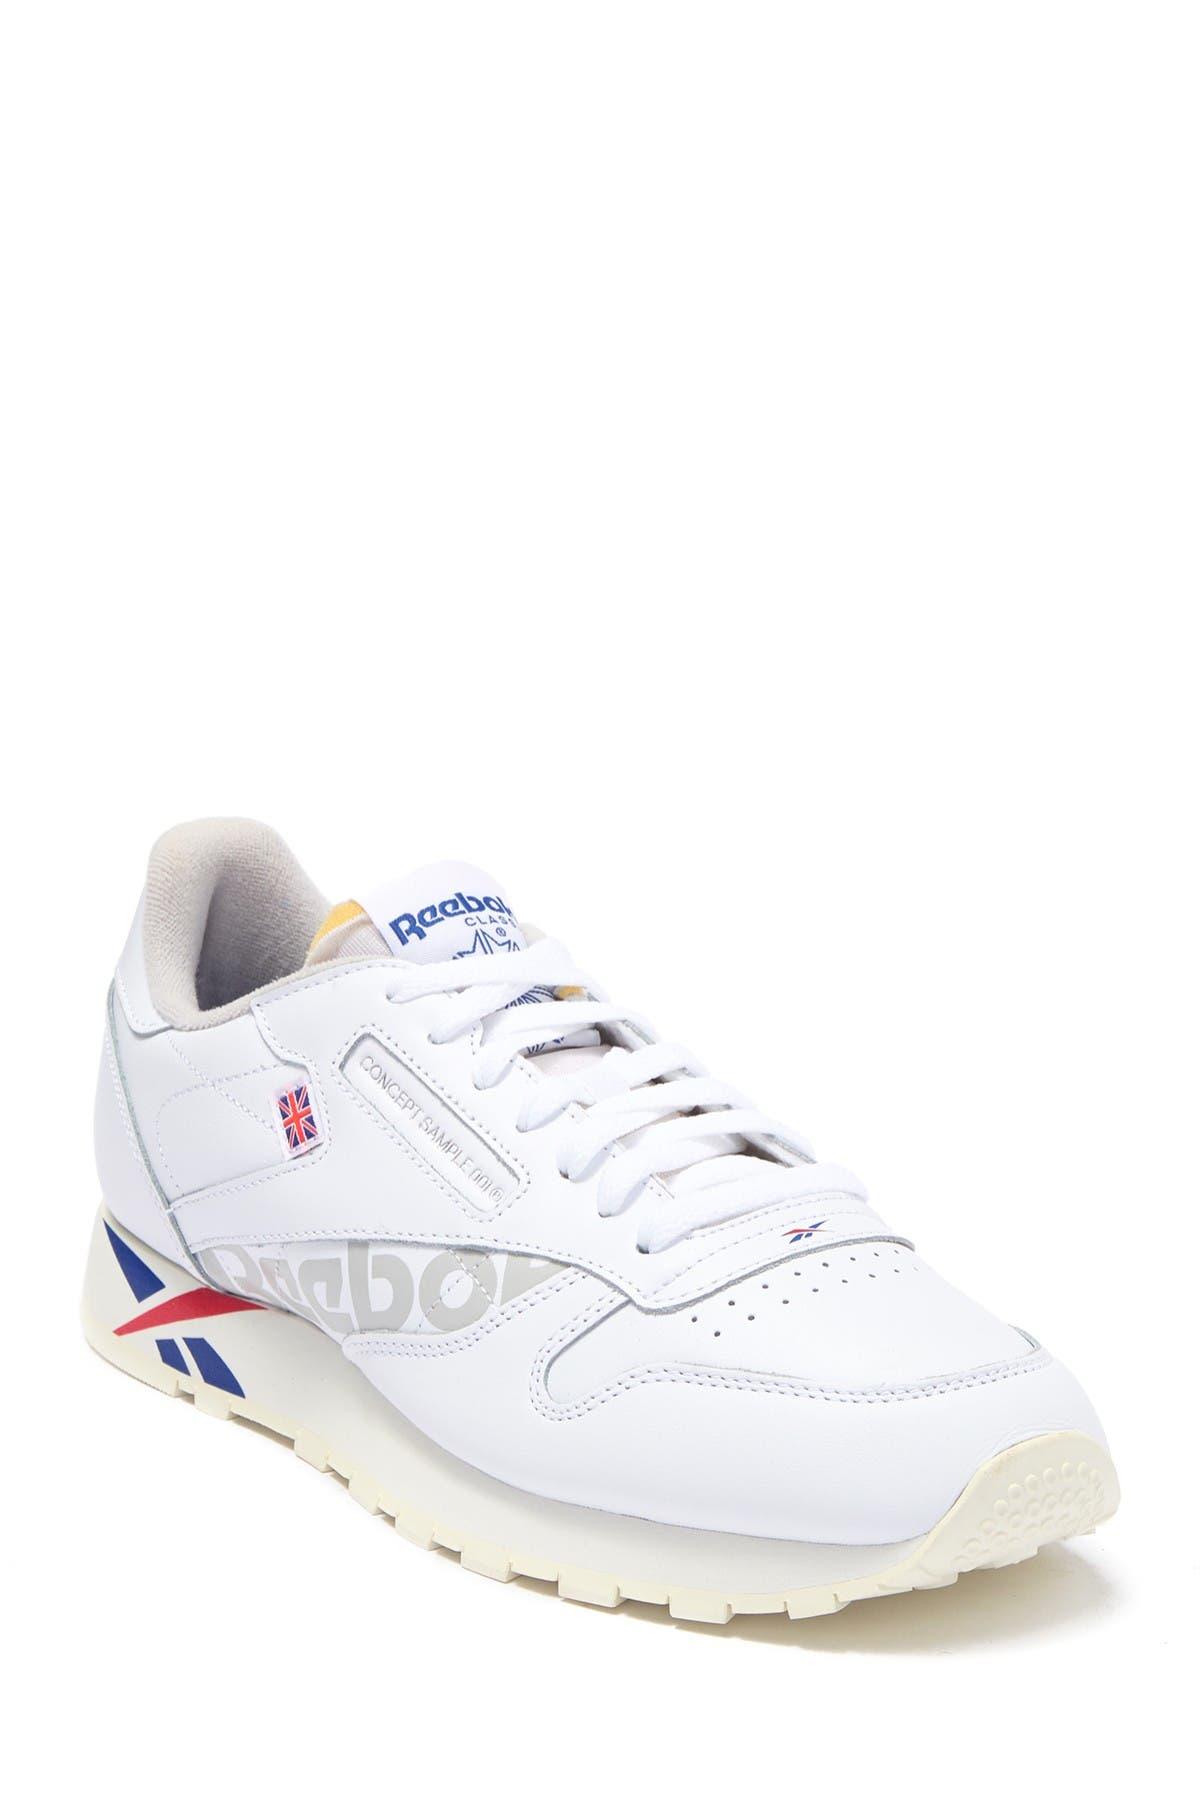 Reebok | Classic Leather MU Sneaker